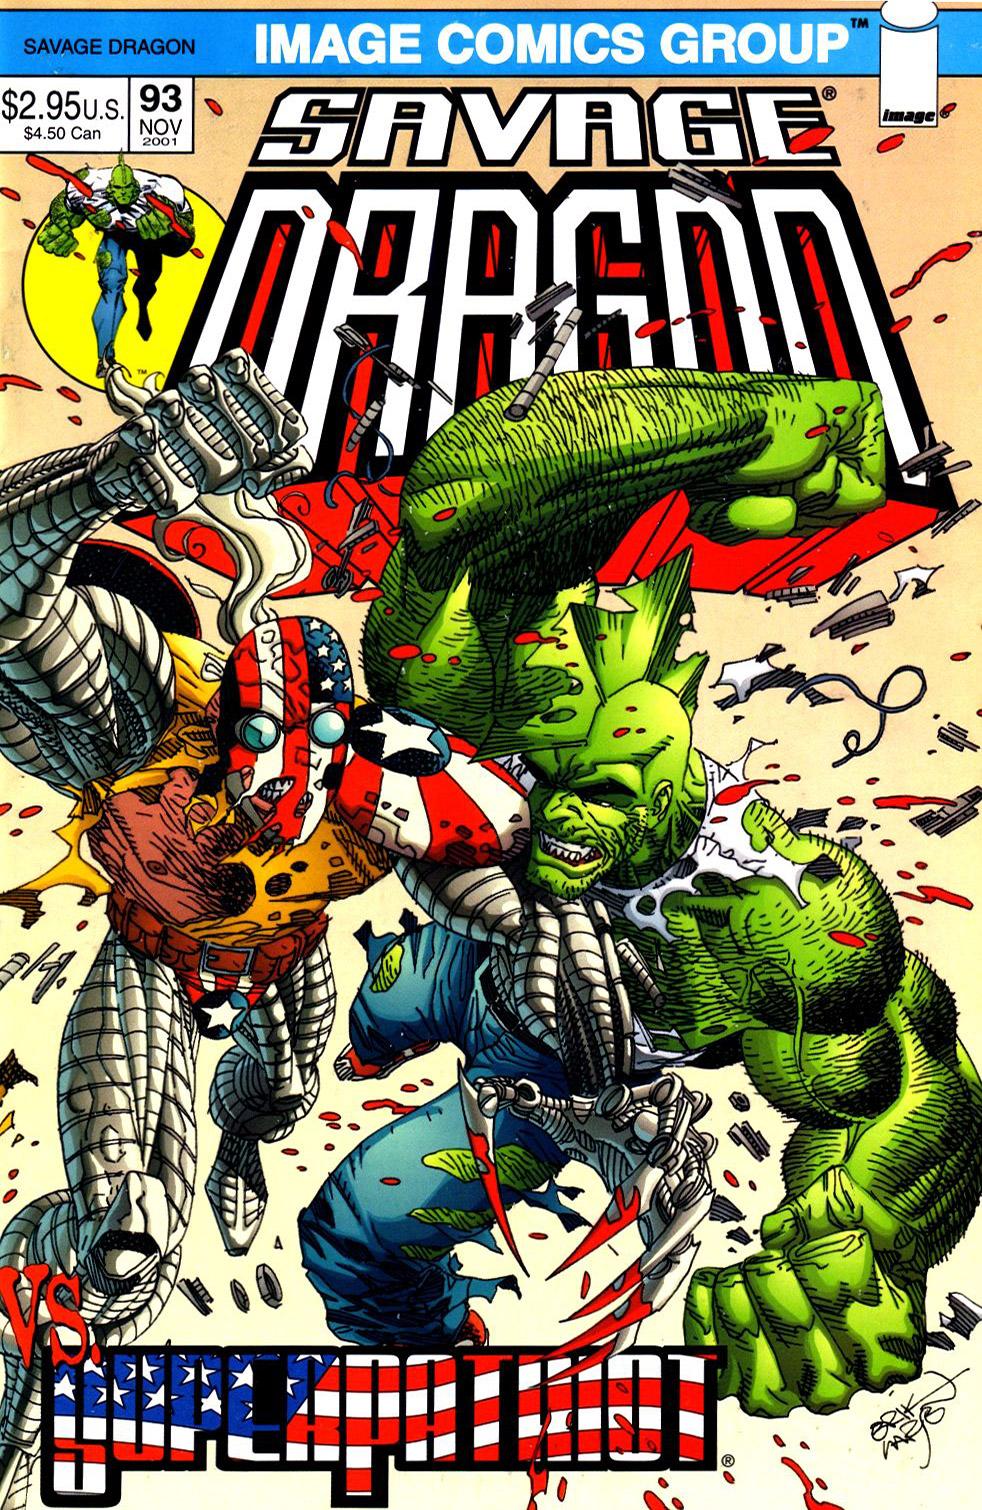 Cover Savage Dragon Vol.2 #93